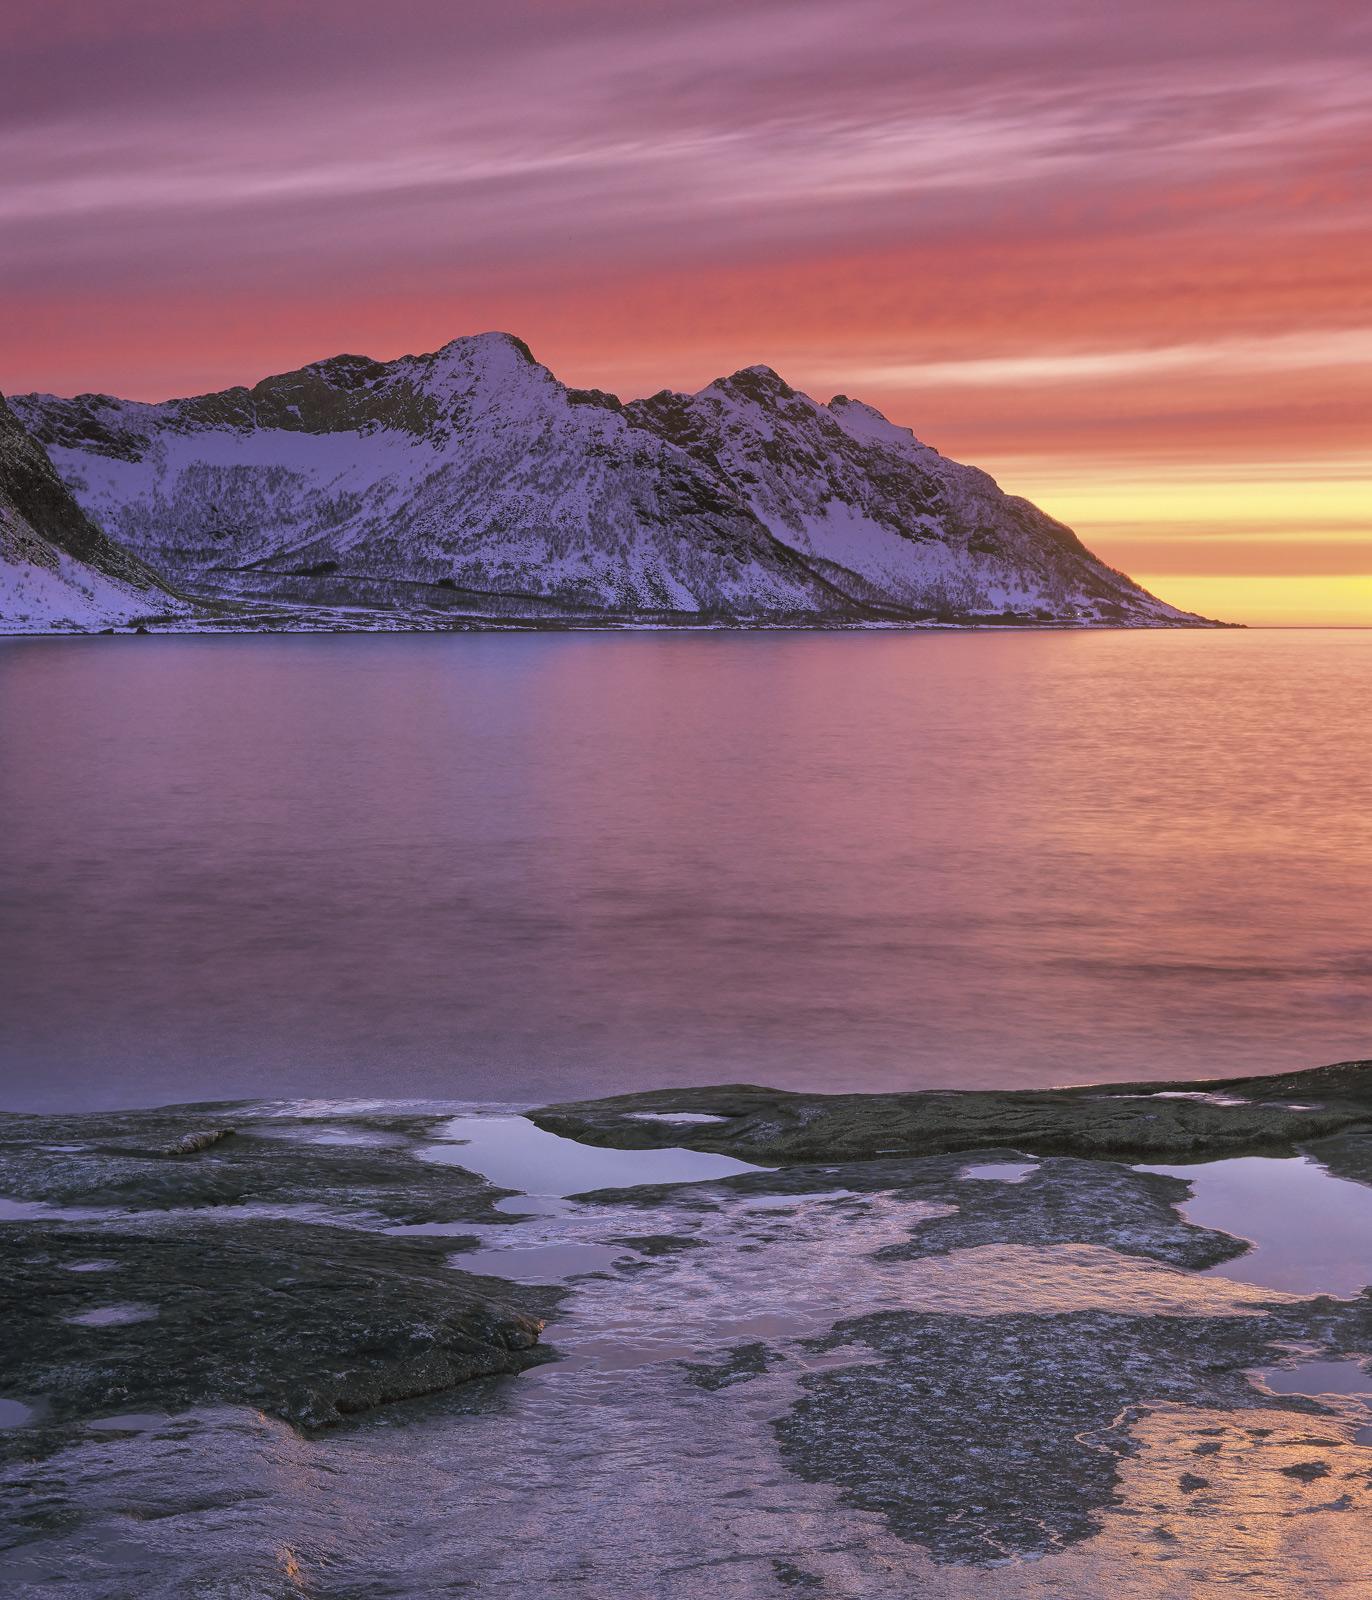 Tungeneset Sunset, Tungeneset, Senja, Norway, stunning, sunset, iconic, contrast, sea, land , photo